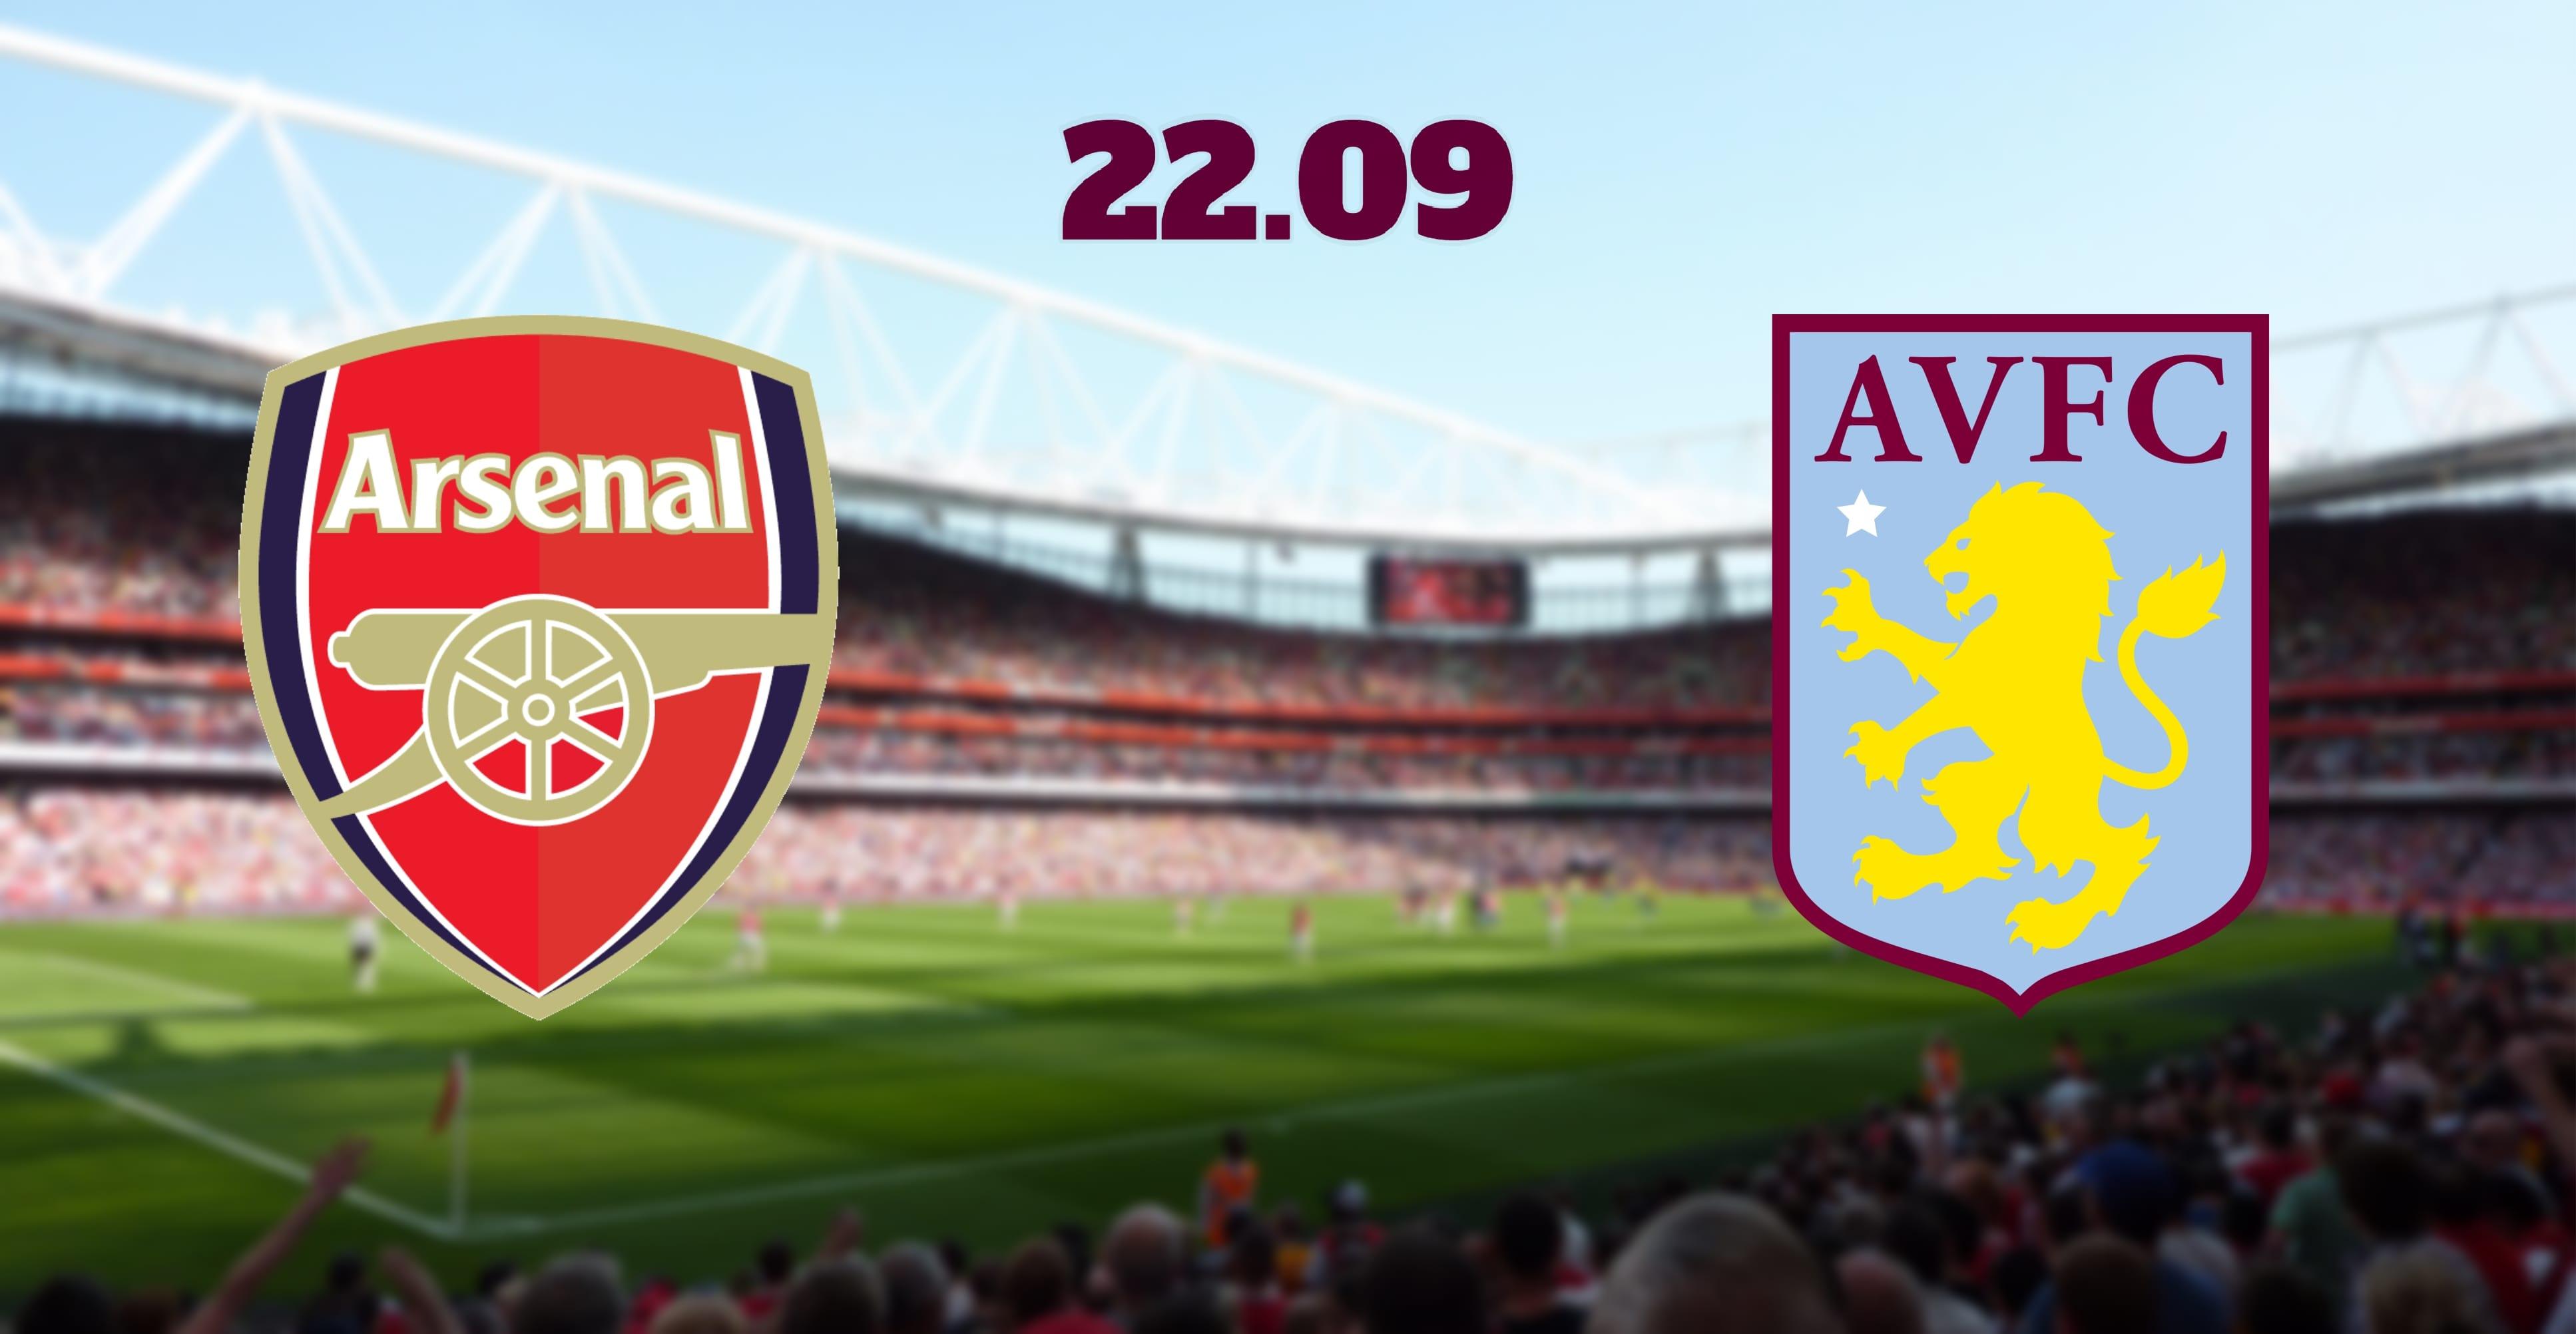 Arsenal vs Aston Villa Prediction, H2H and Betting Tip: 22.09.2019 EPL Match